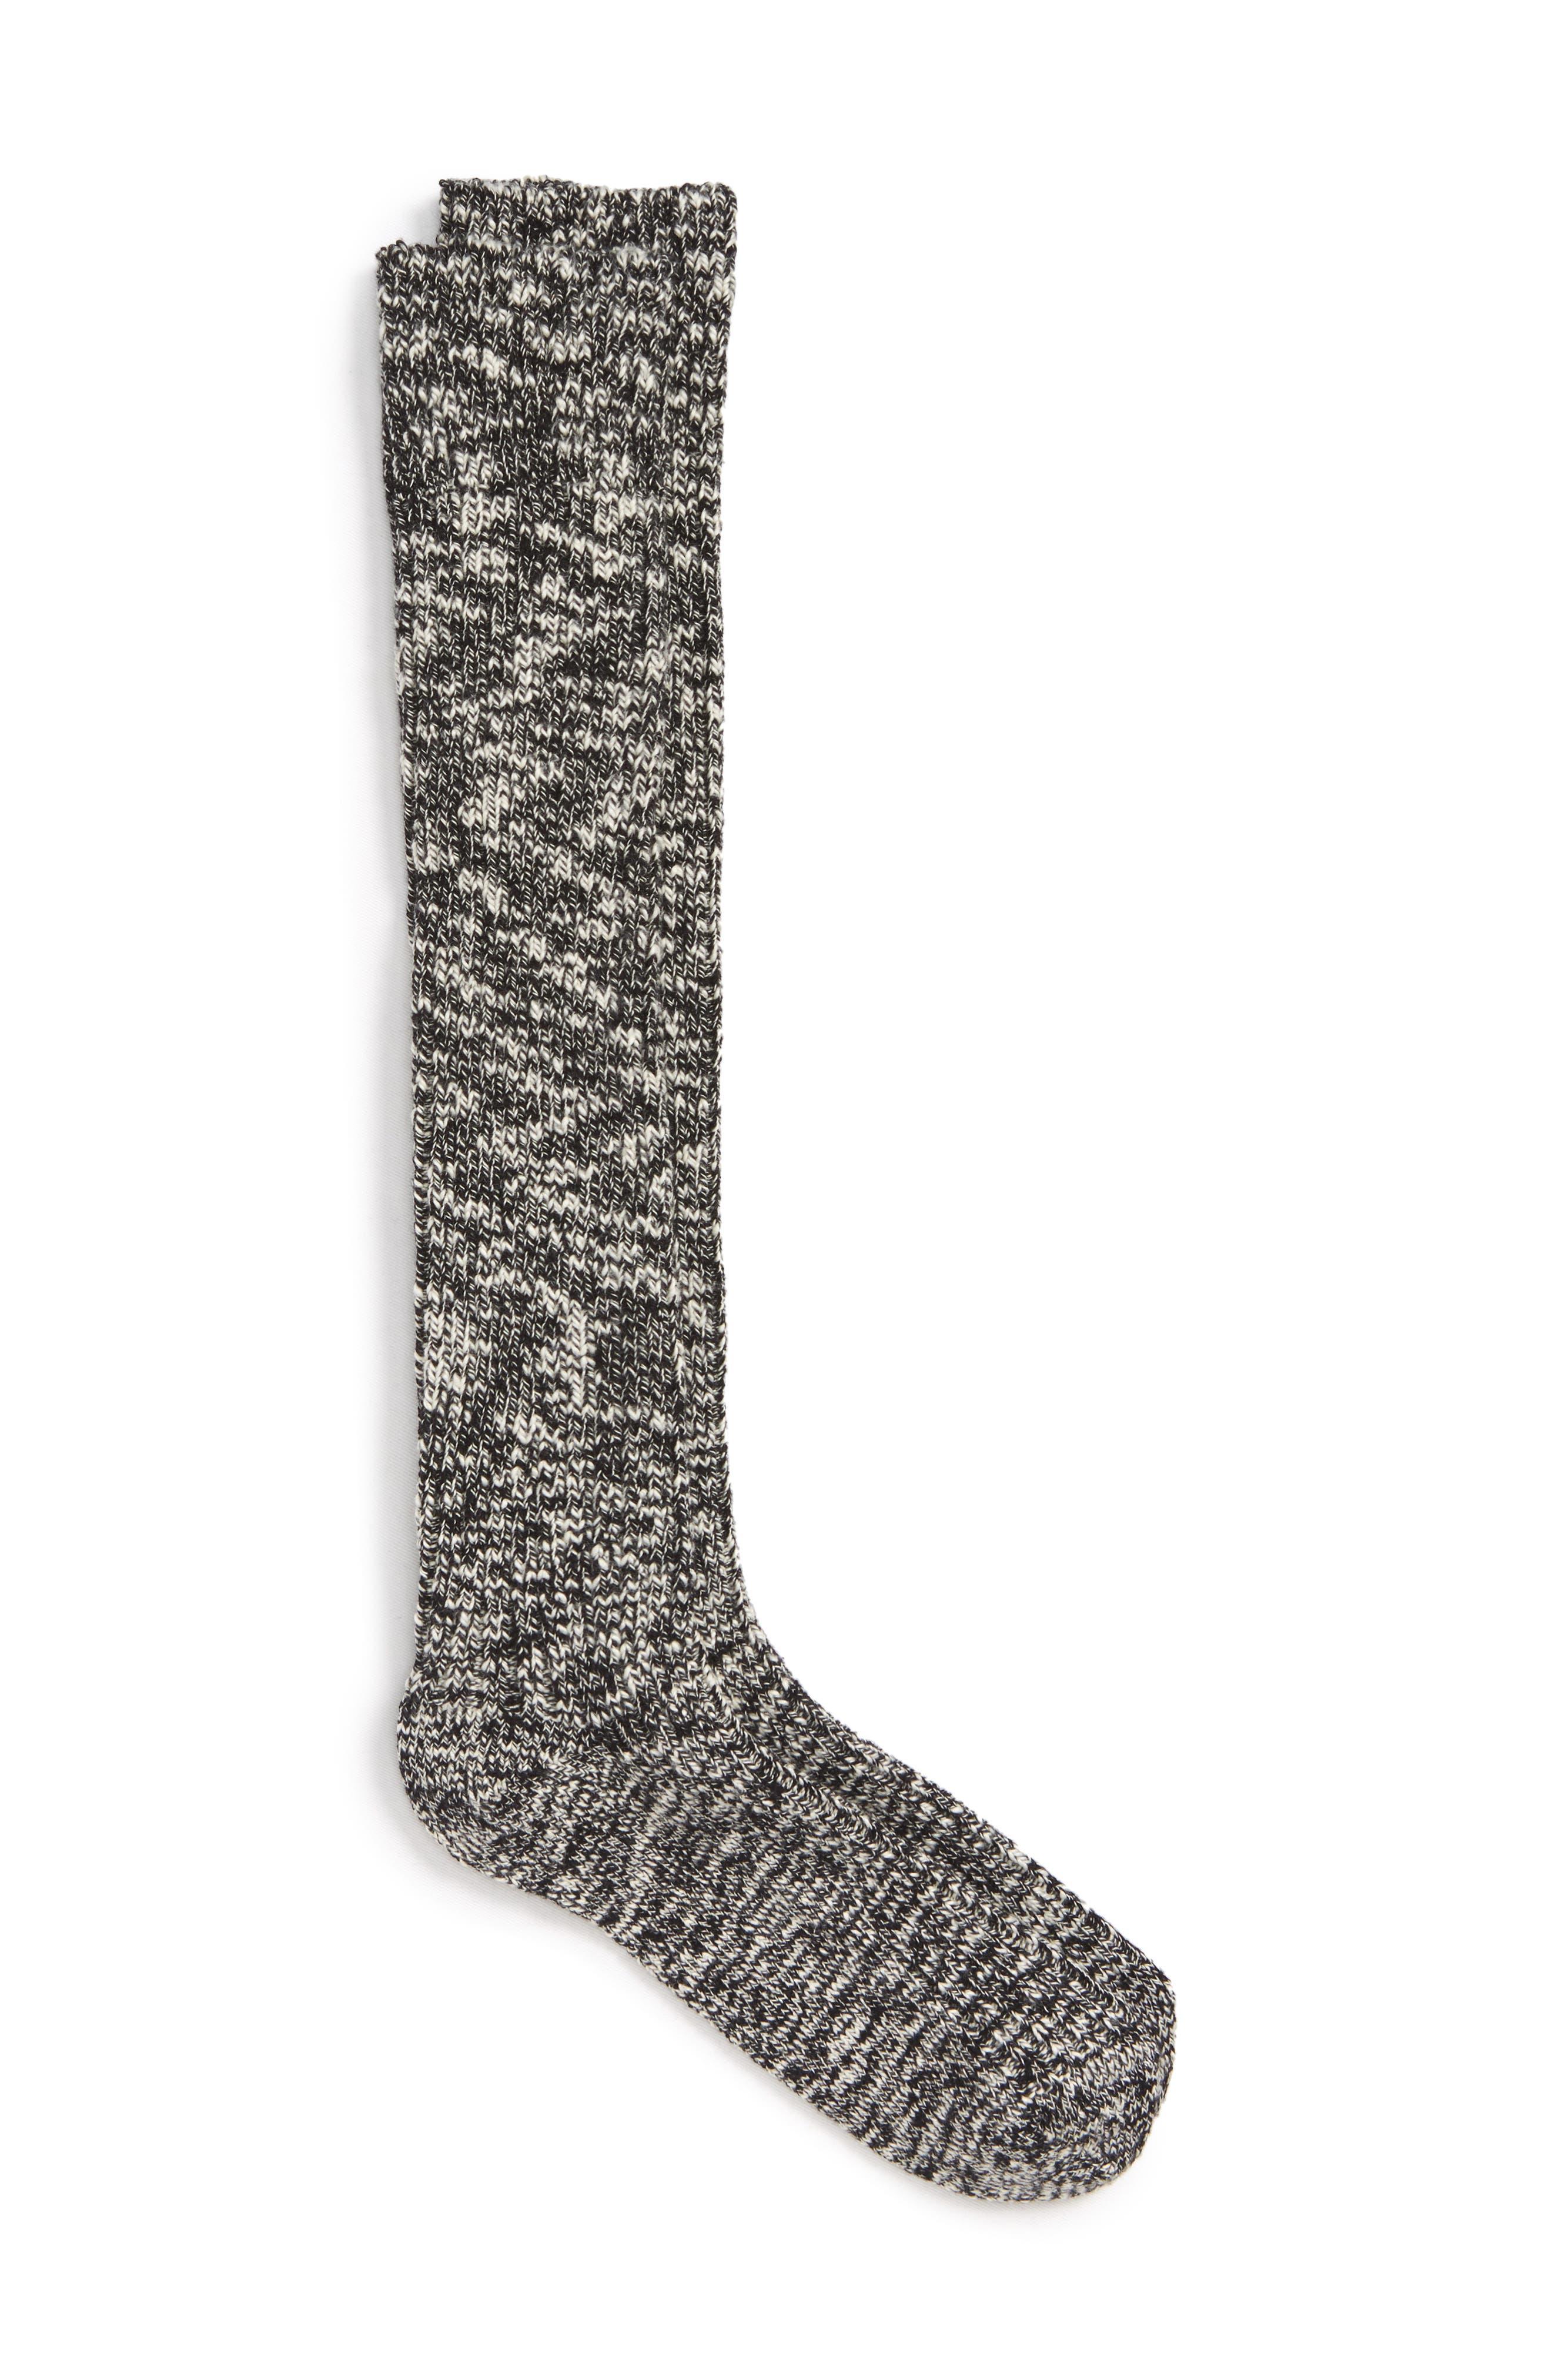 Rick Owens x Birkenstock Tall Socks,                             Main thumbnail 1, color,                             Melange Heather